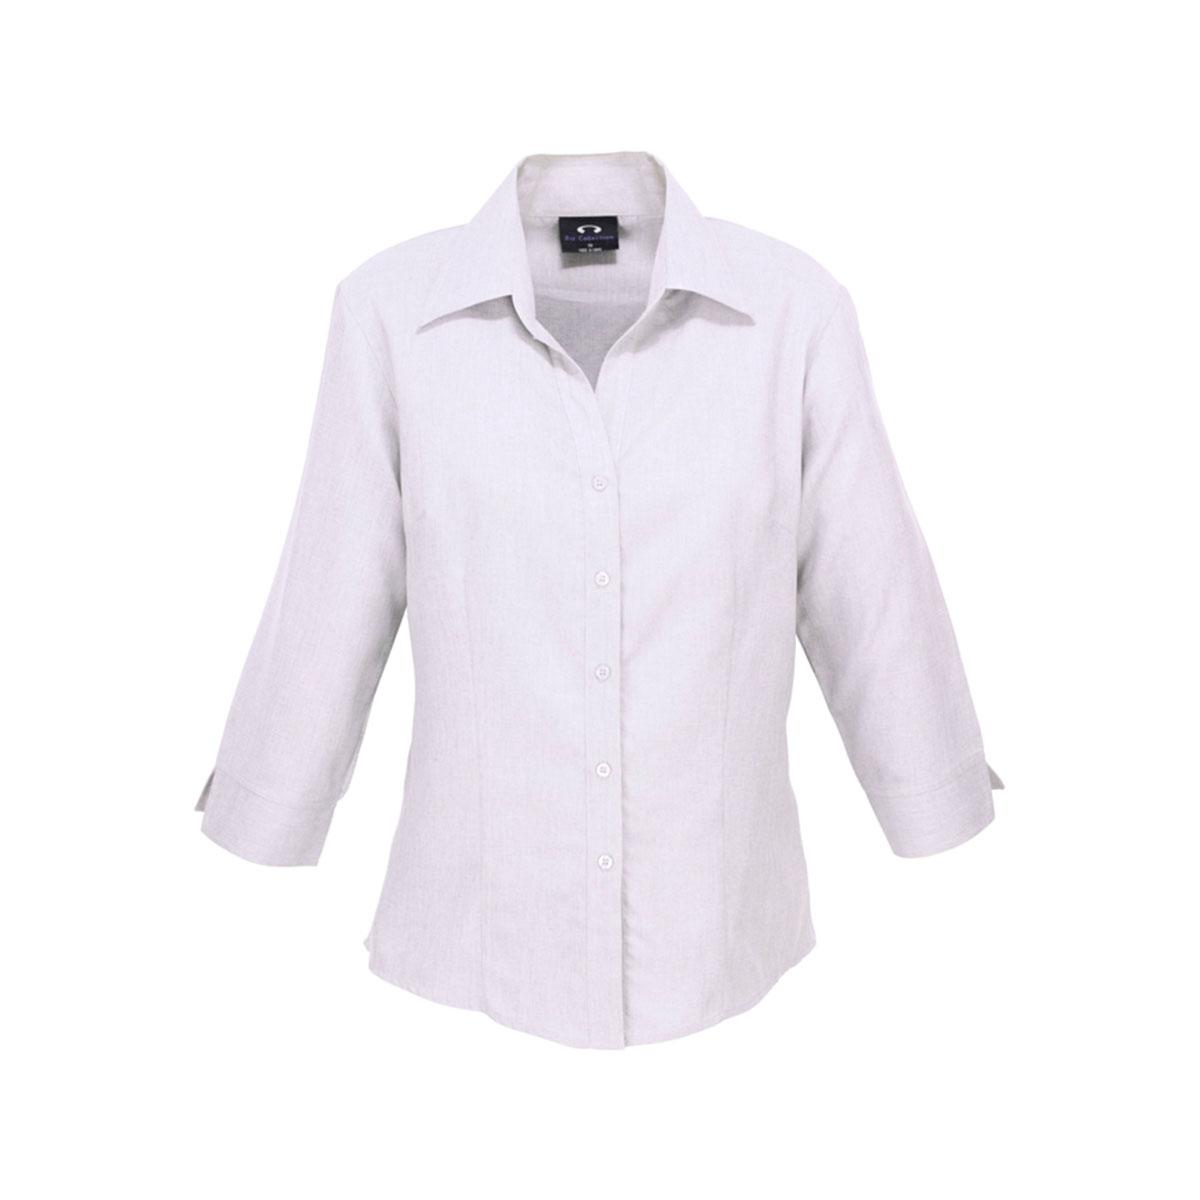 Ladies Plain Oasis 3/4 Sleeve Shirt-White